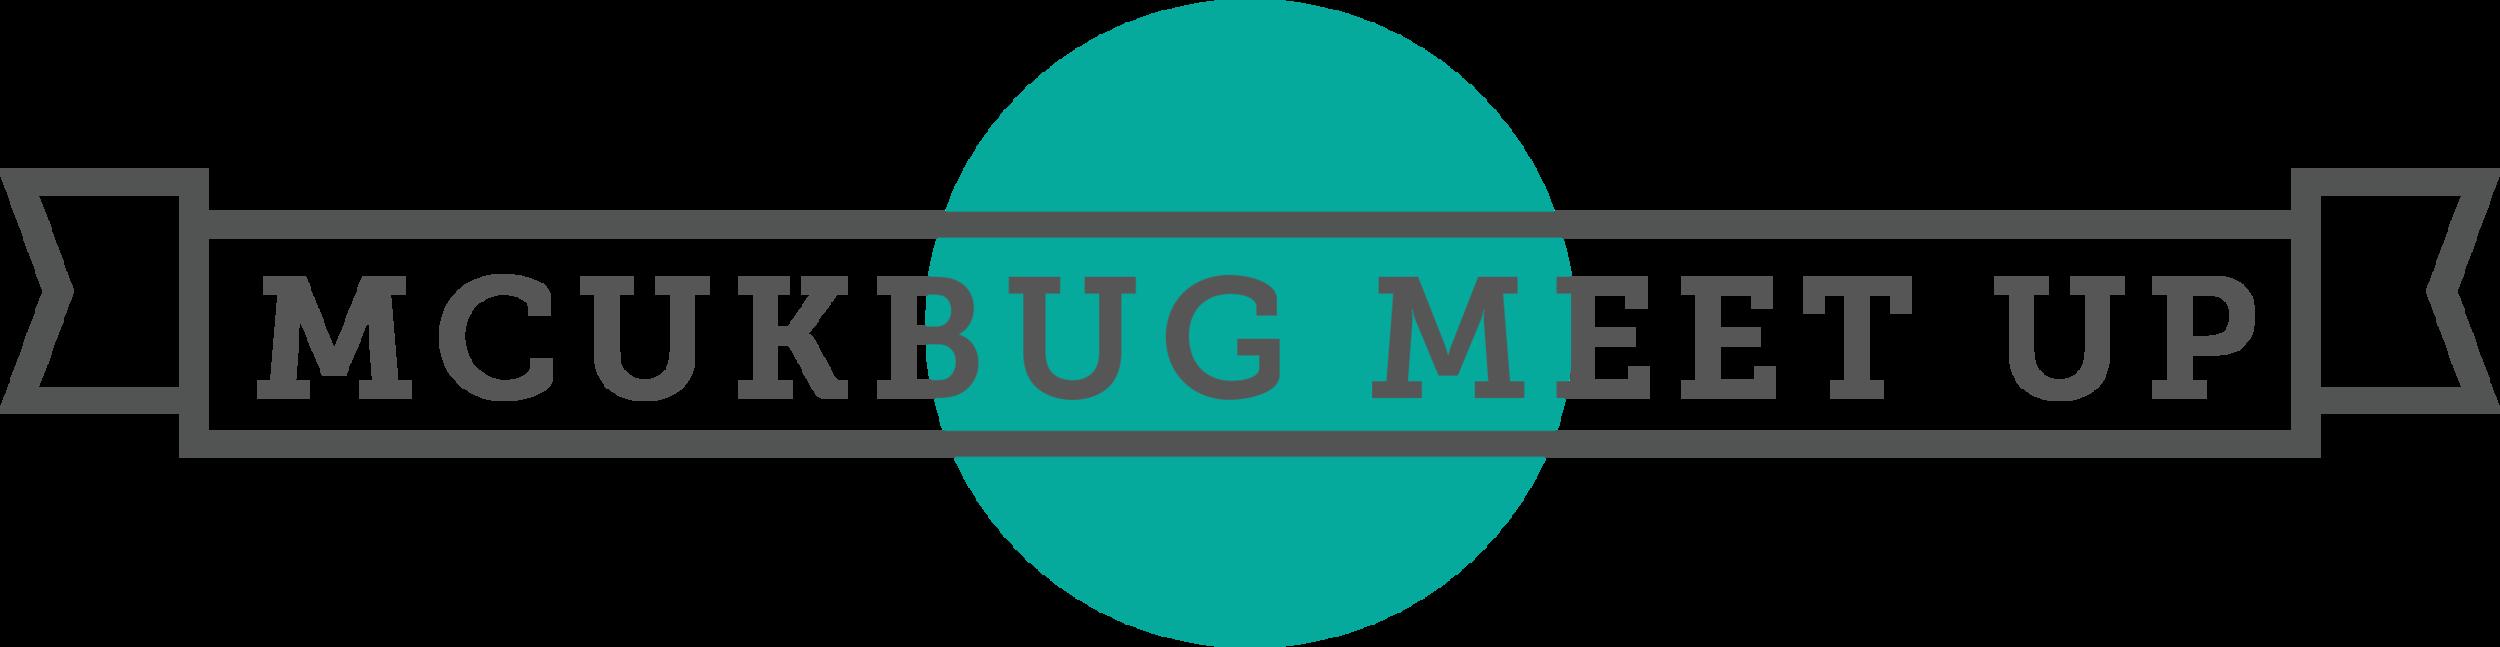 mcukbug-meetup-landscape.png